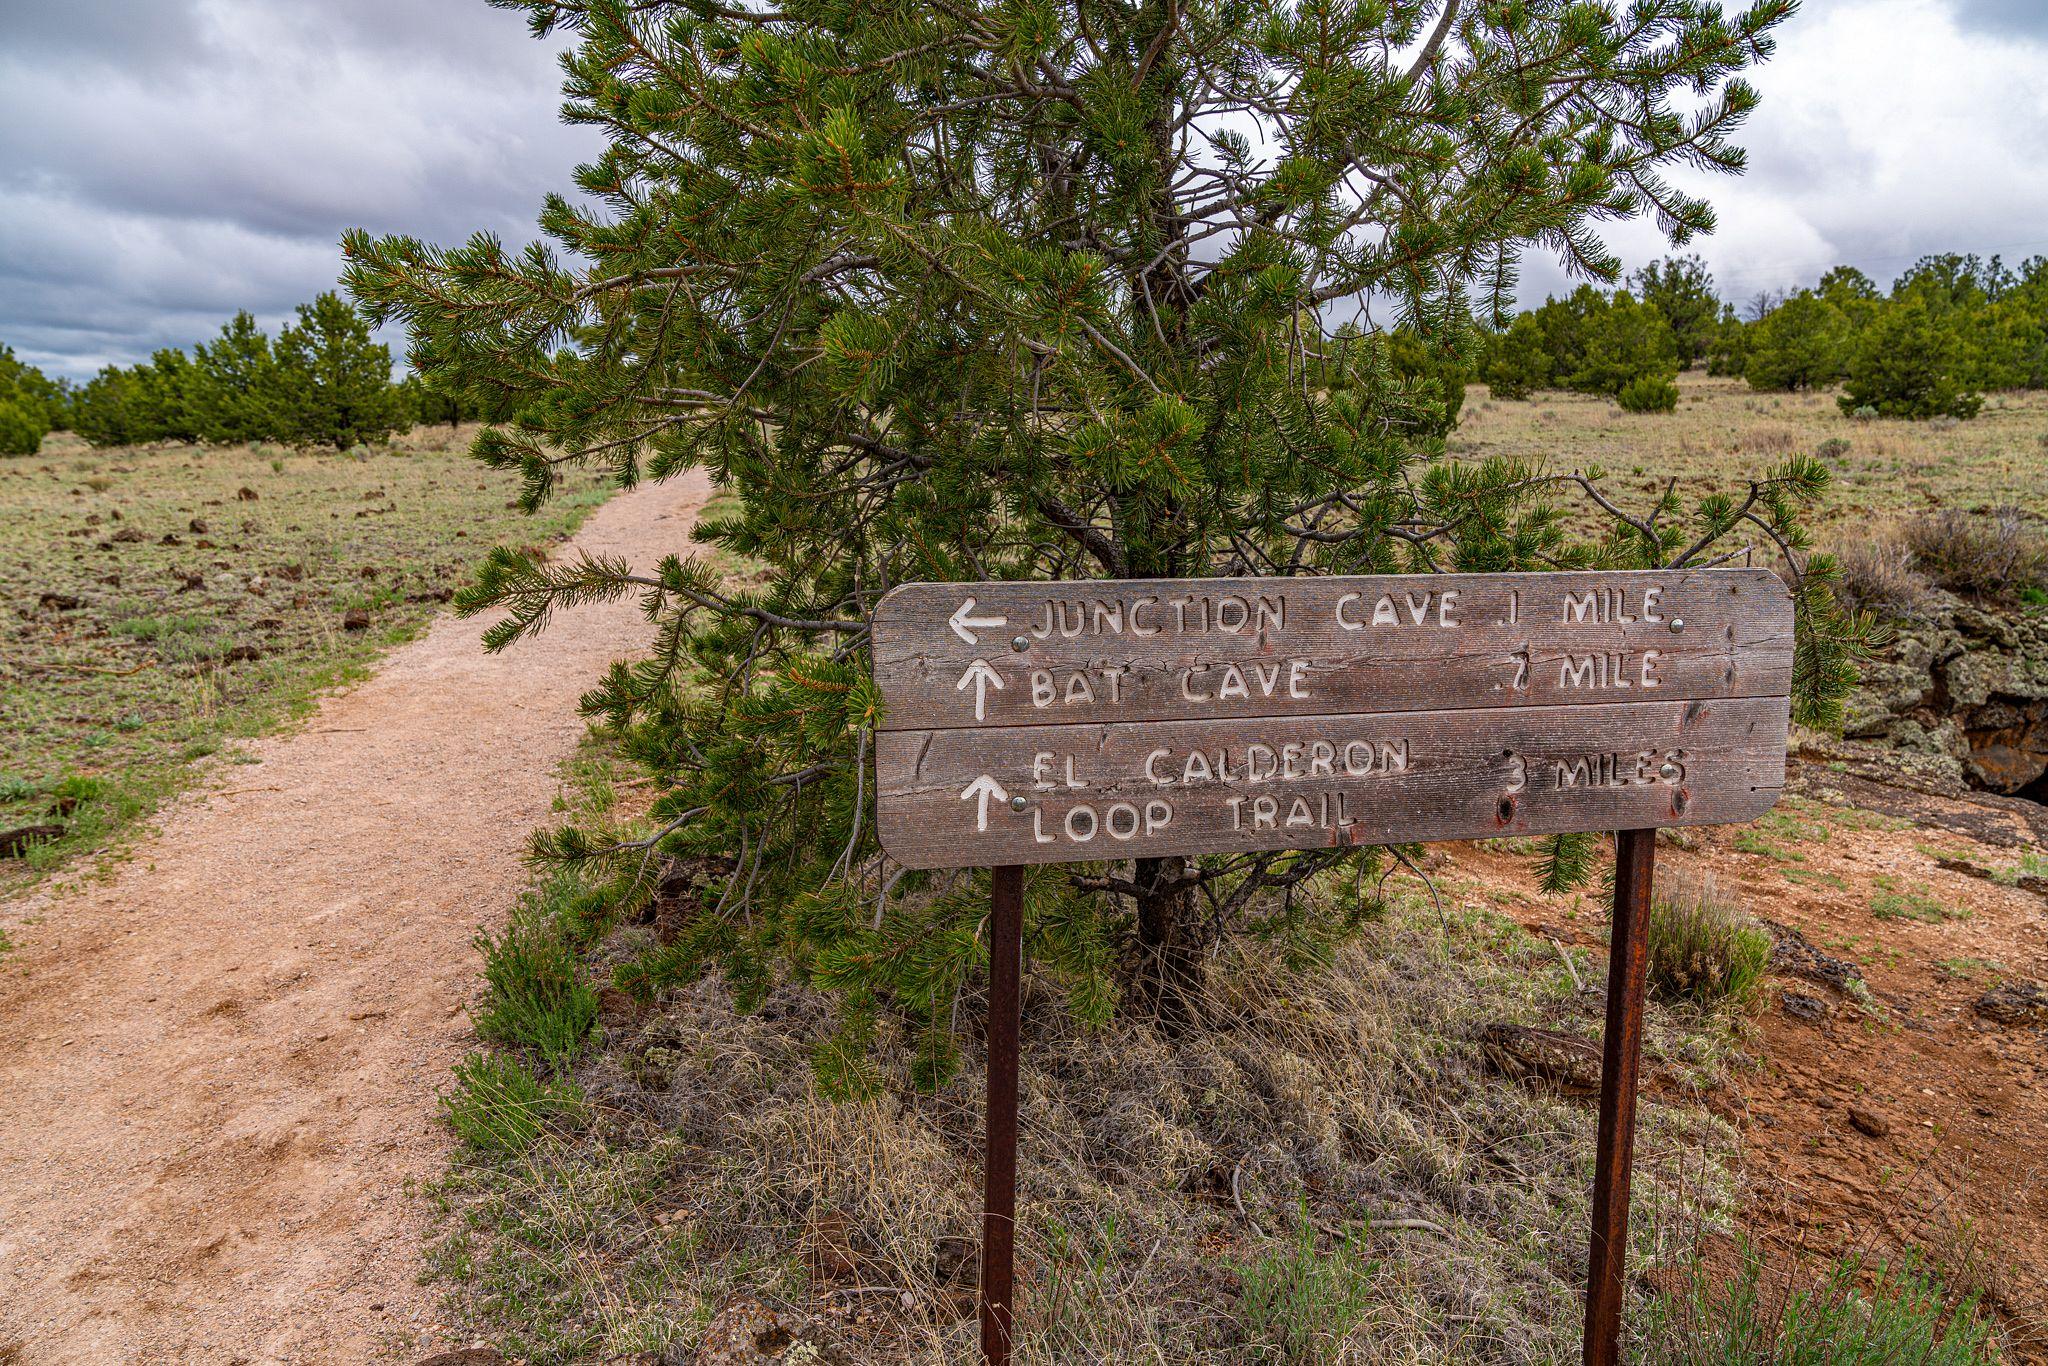 El Calderon Loop Trail